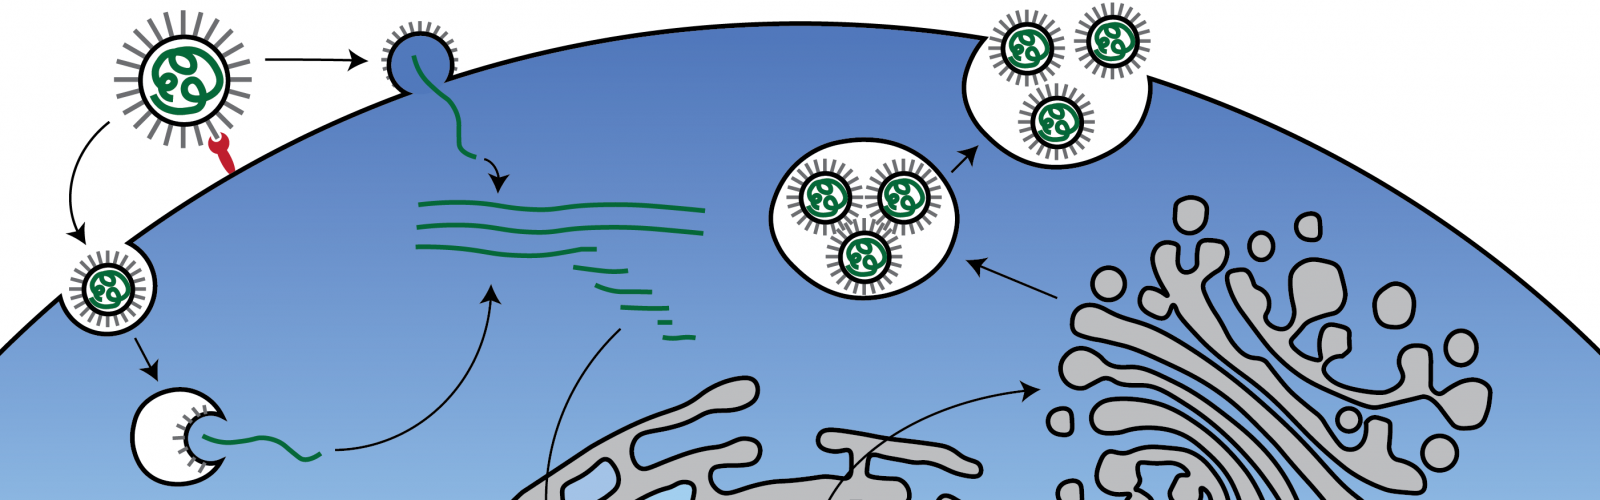 coronavirus replication cycle